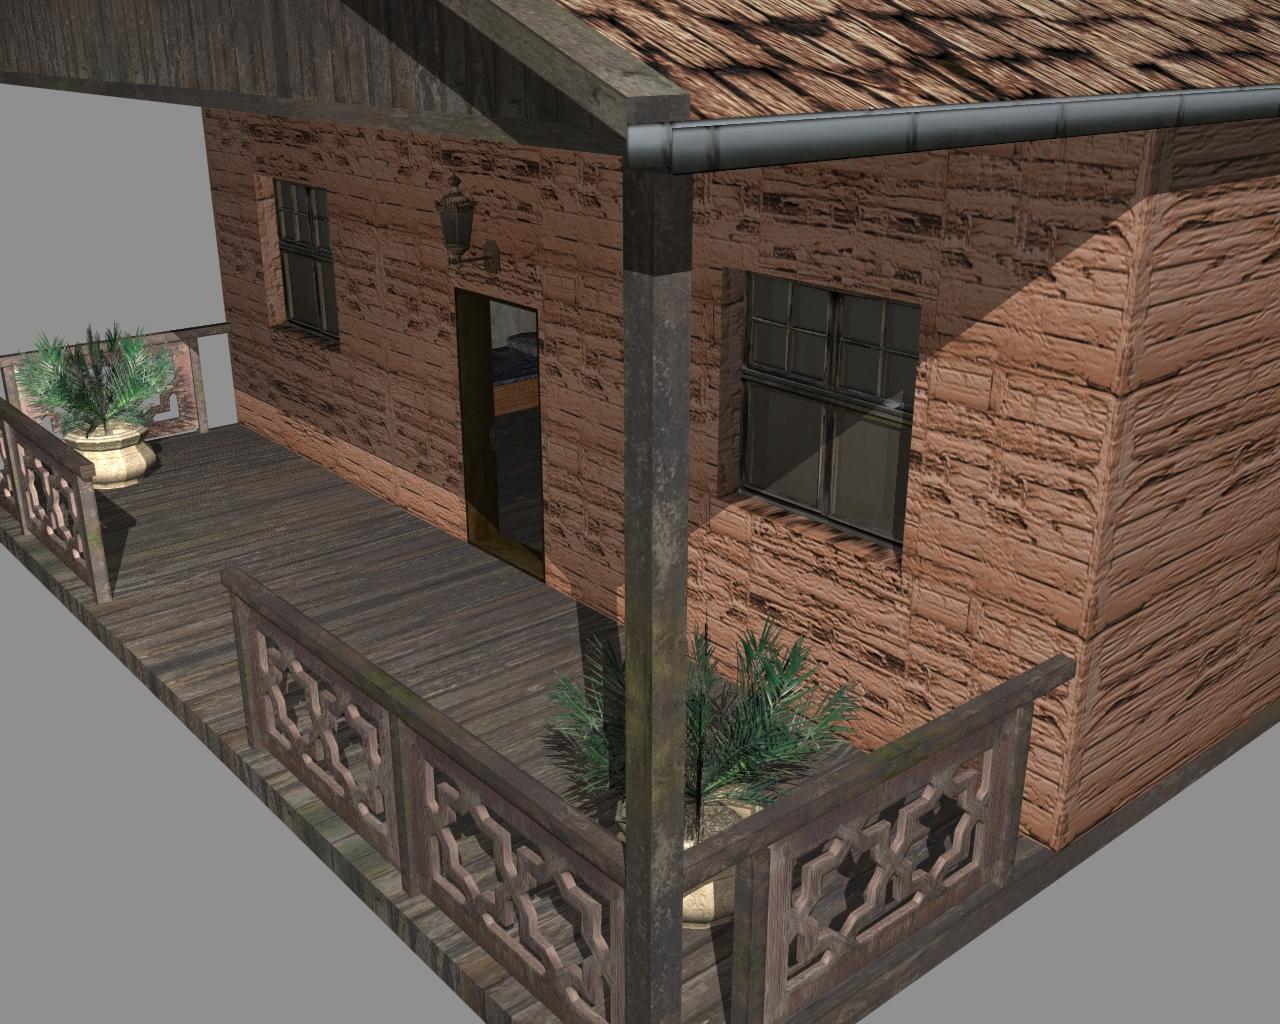 wooden house 2 3d model 3ds 166195